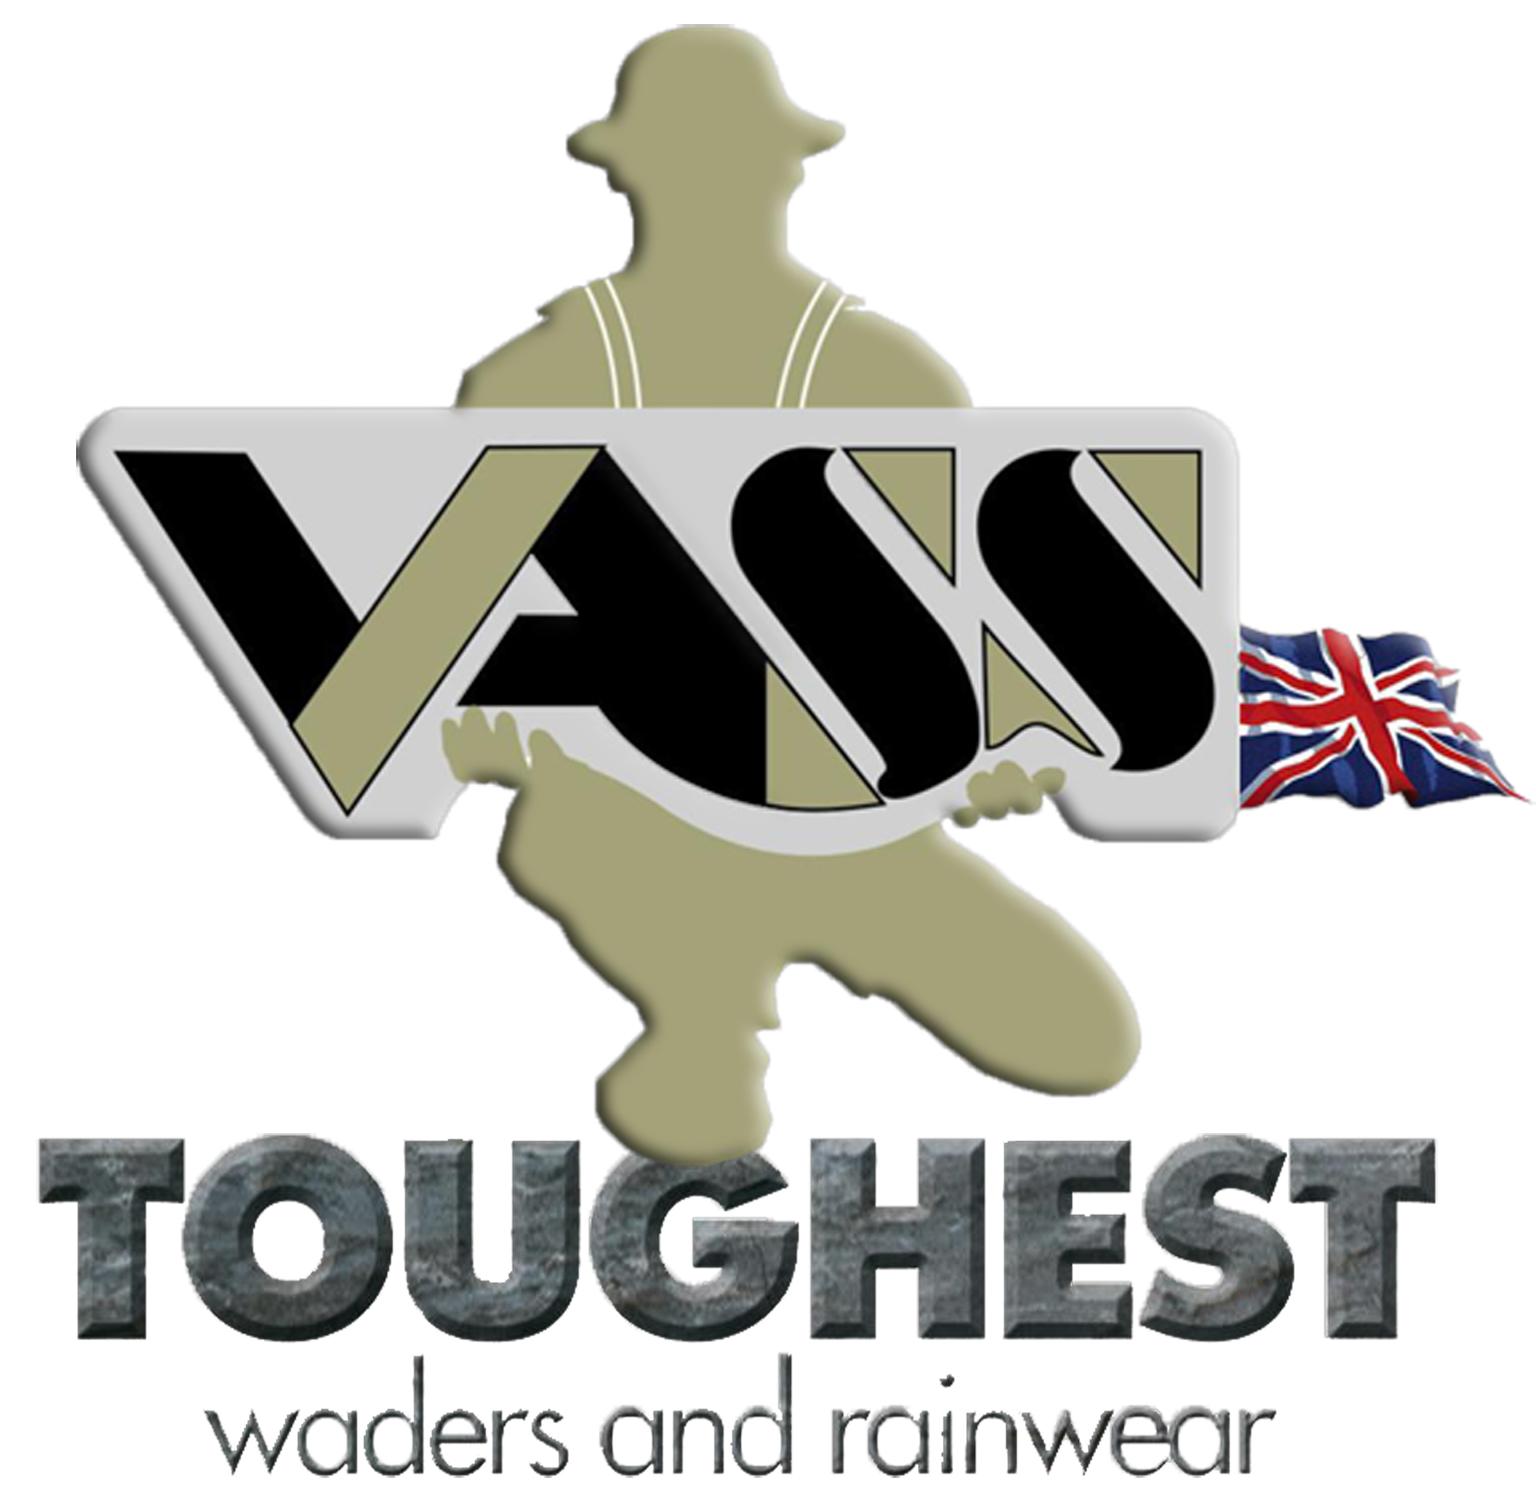 Vass  Fishing (Tougest waders & rainwear) 10.6.2015.jpg